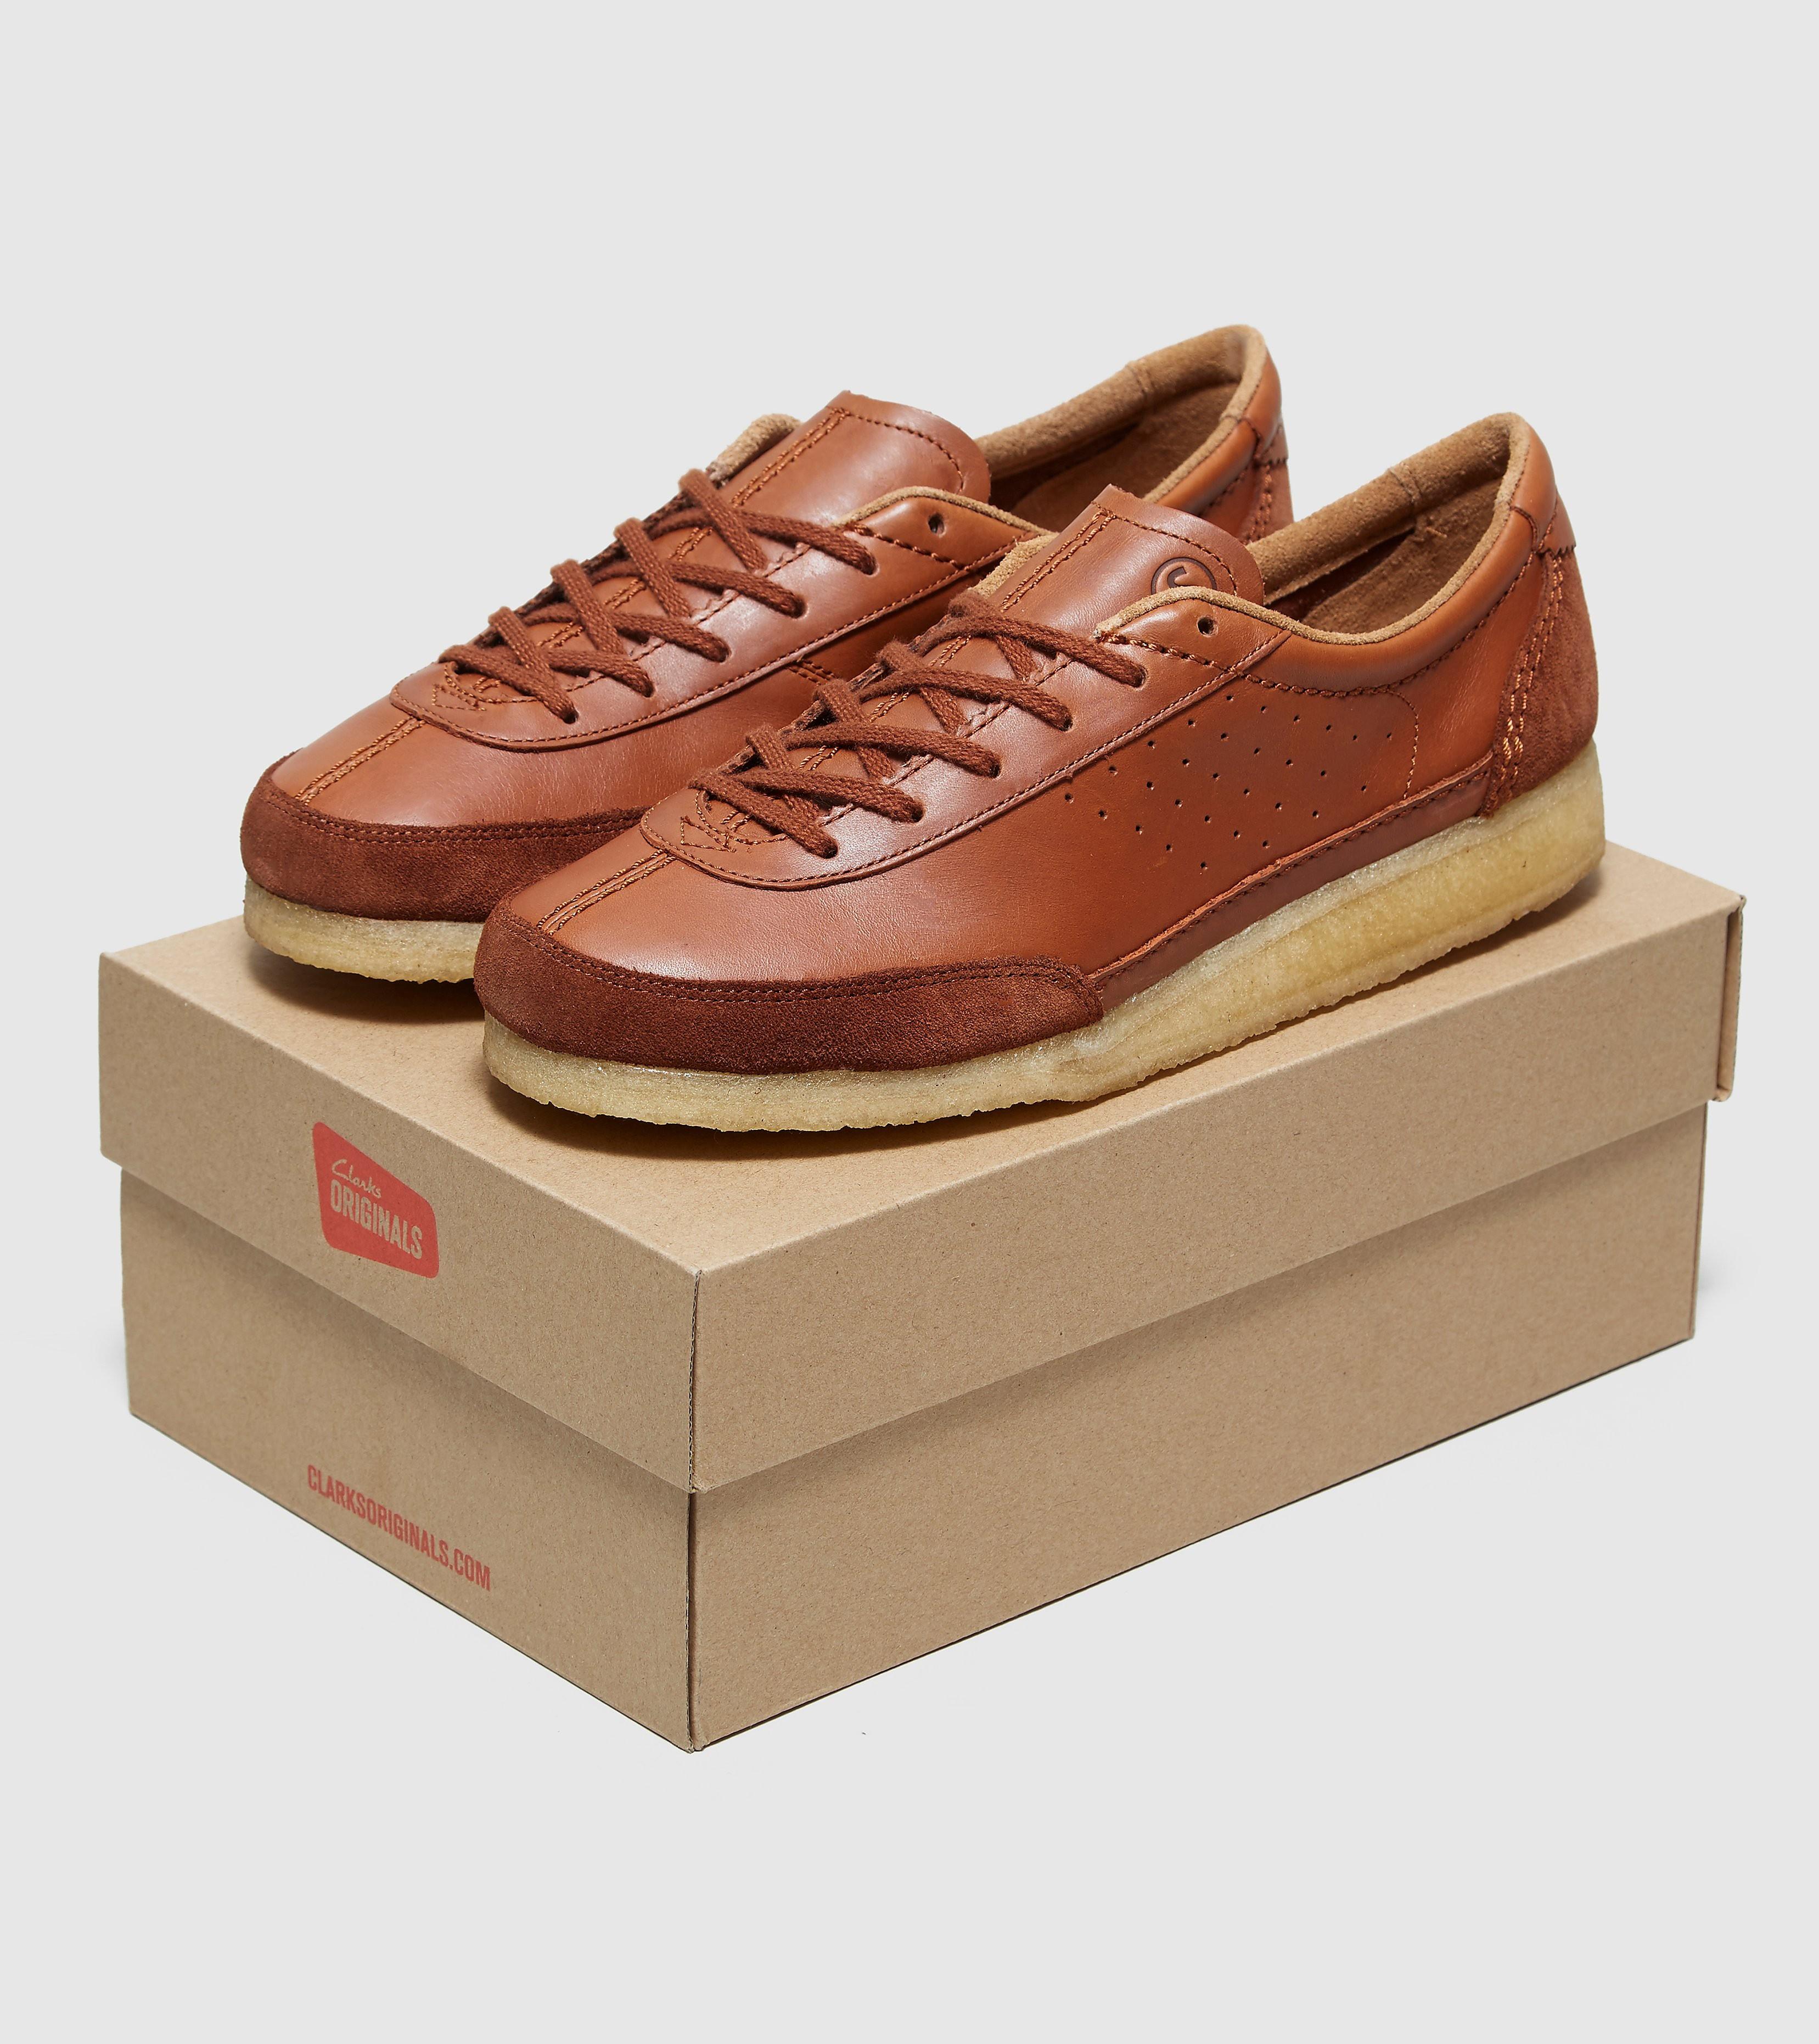 Clarks Originals Torcourt Leather